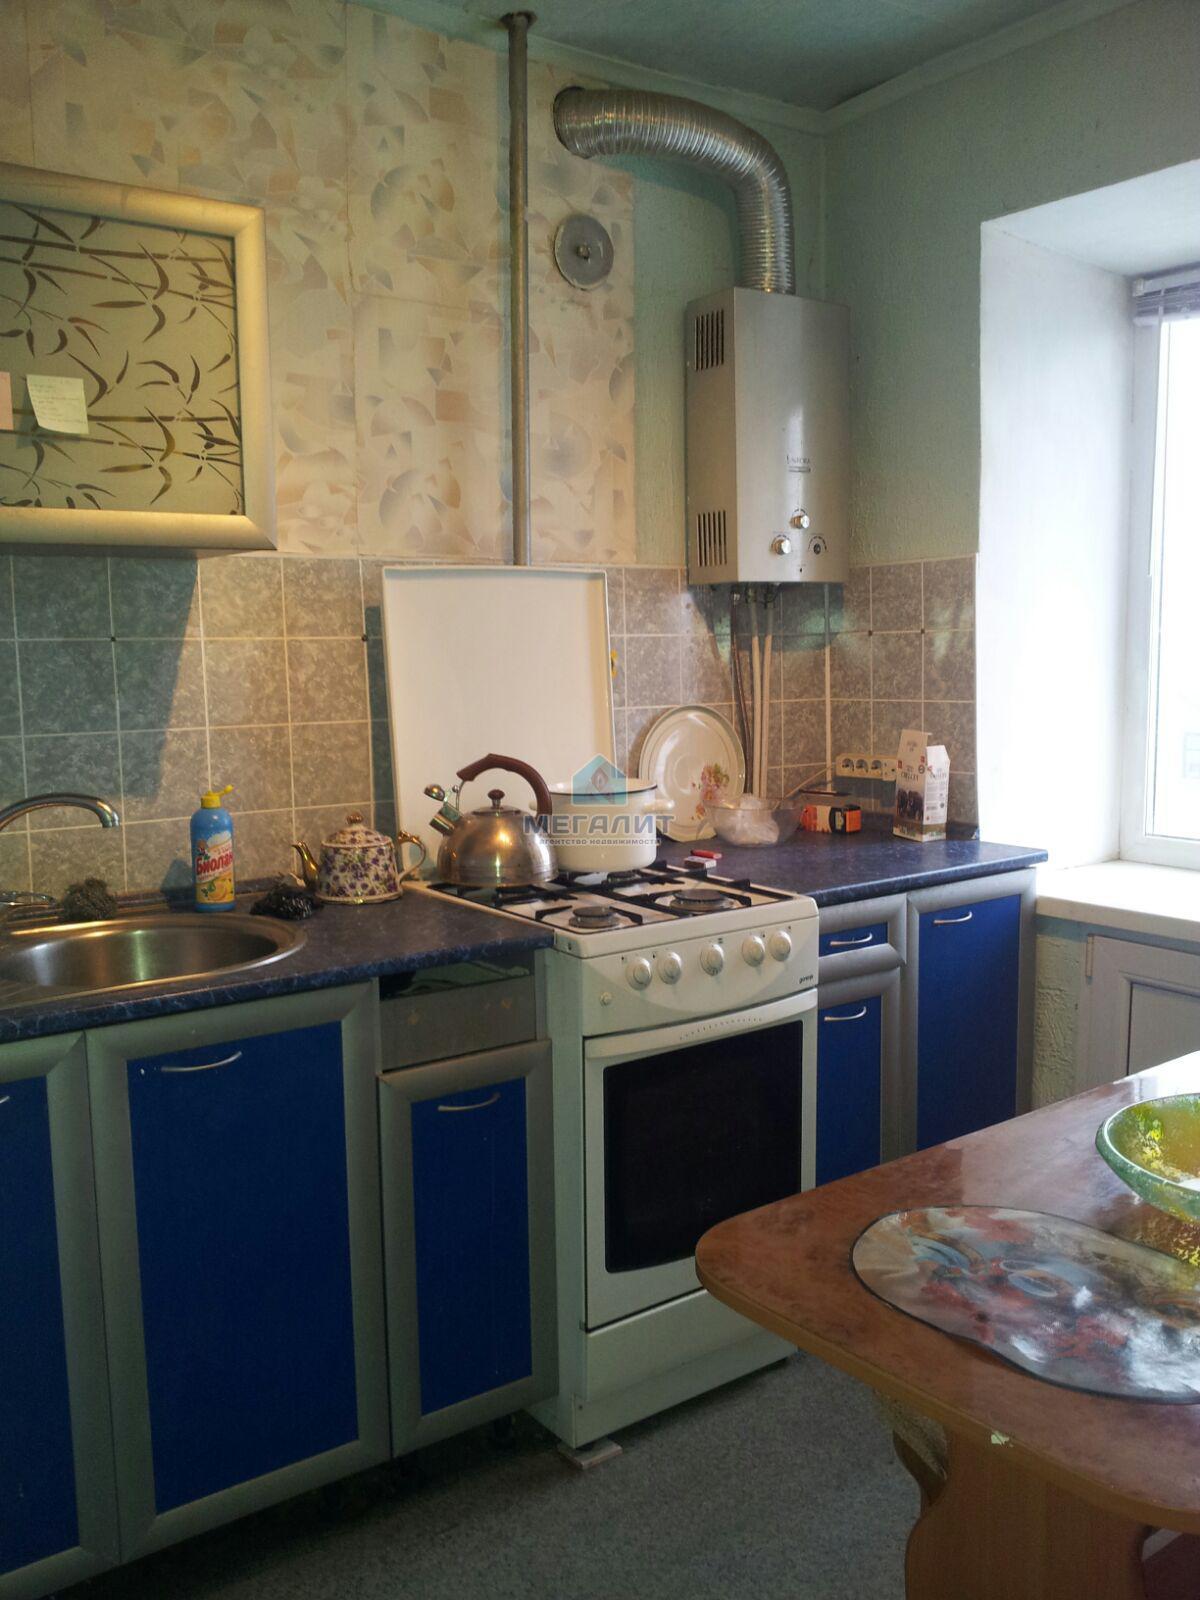 Аренда 2-к квартиры Краснооктябрьская 17, 45.0 м² (миниатюра №1)